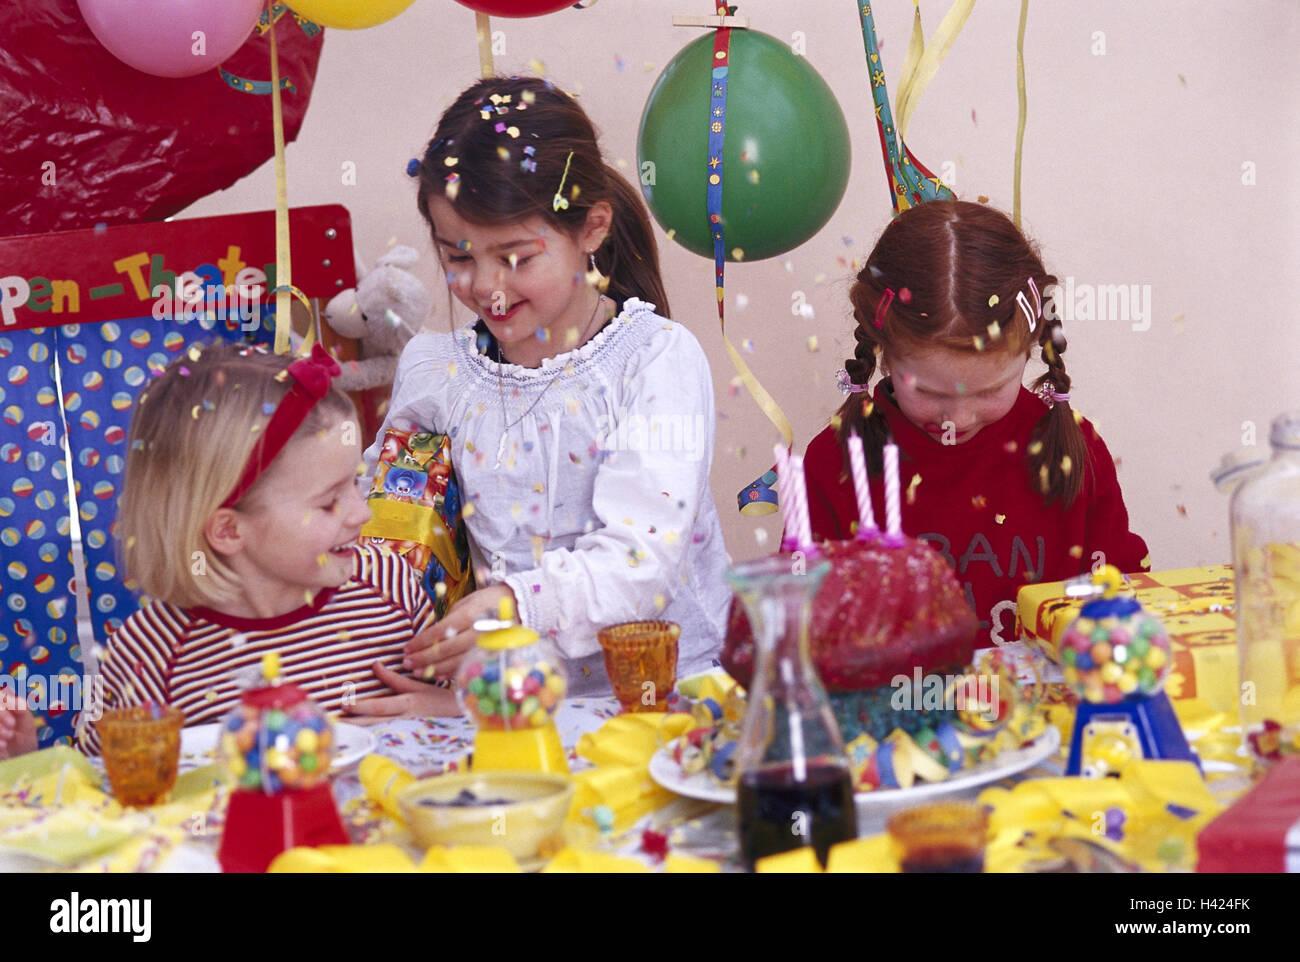 Party Geburtstag Mit Dem Gruffelo Geburtstag Feiern Ideen Diys